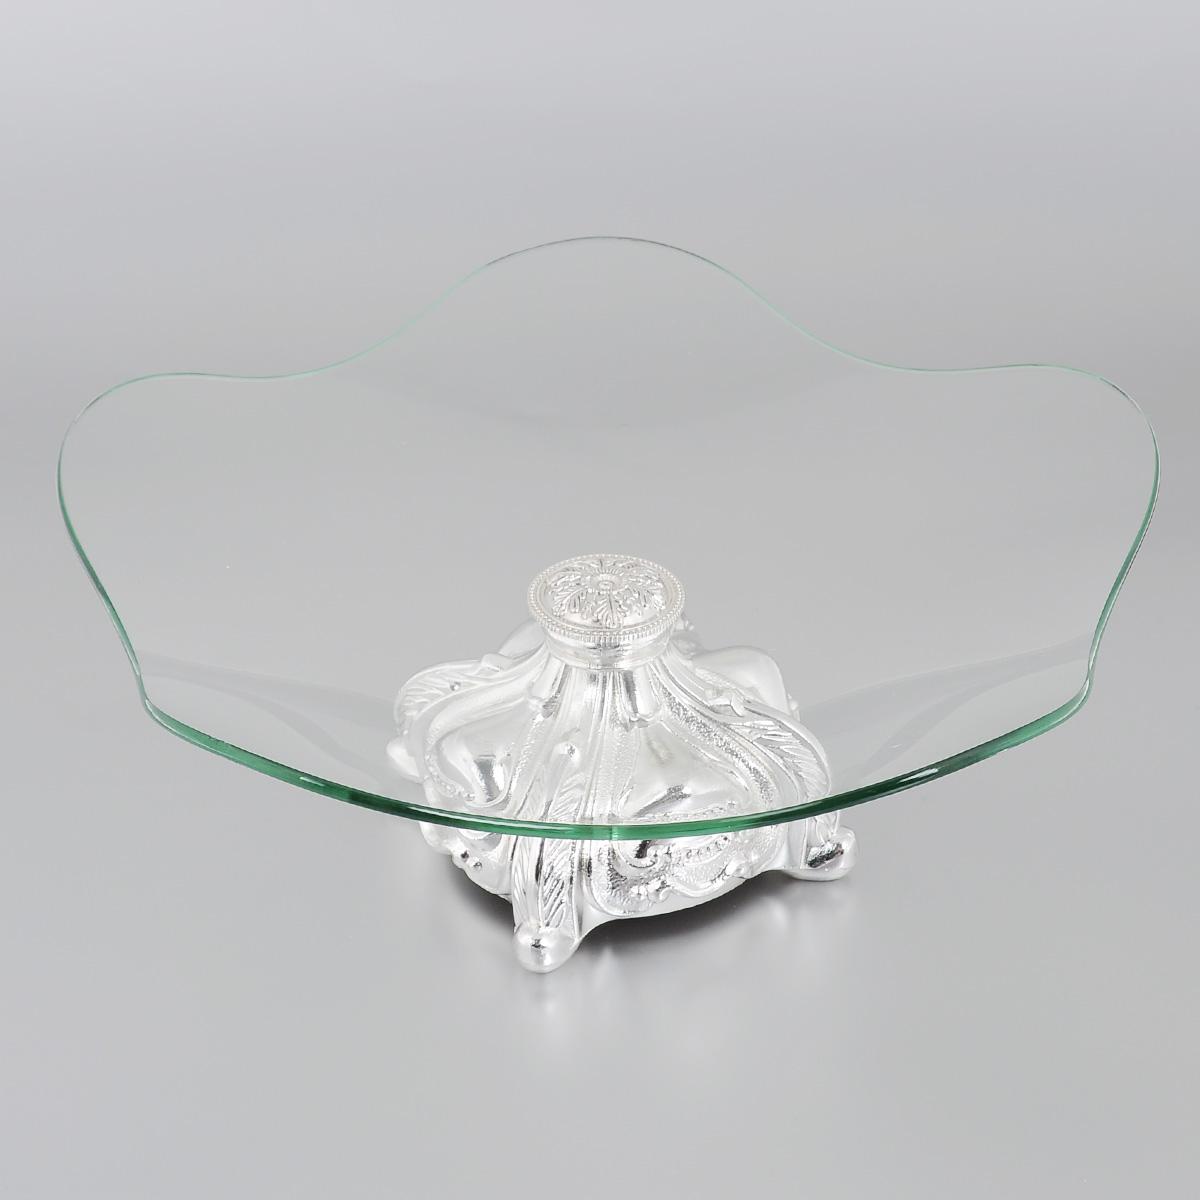 Ваза универсальная Marquis, 30 см х 30 см. 3093-MR ваза для печенья 30 х 53 см